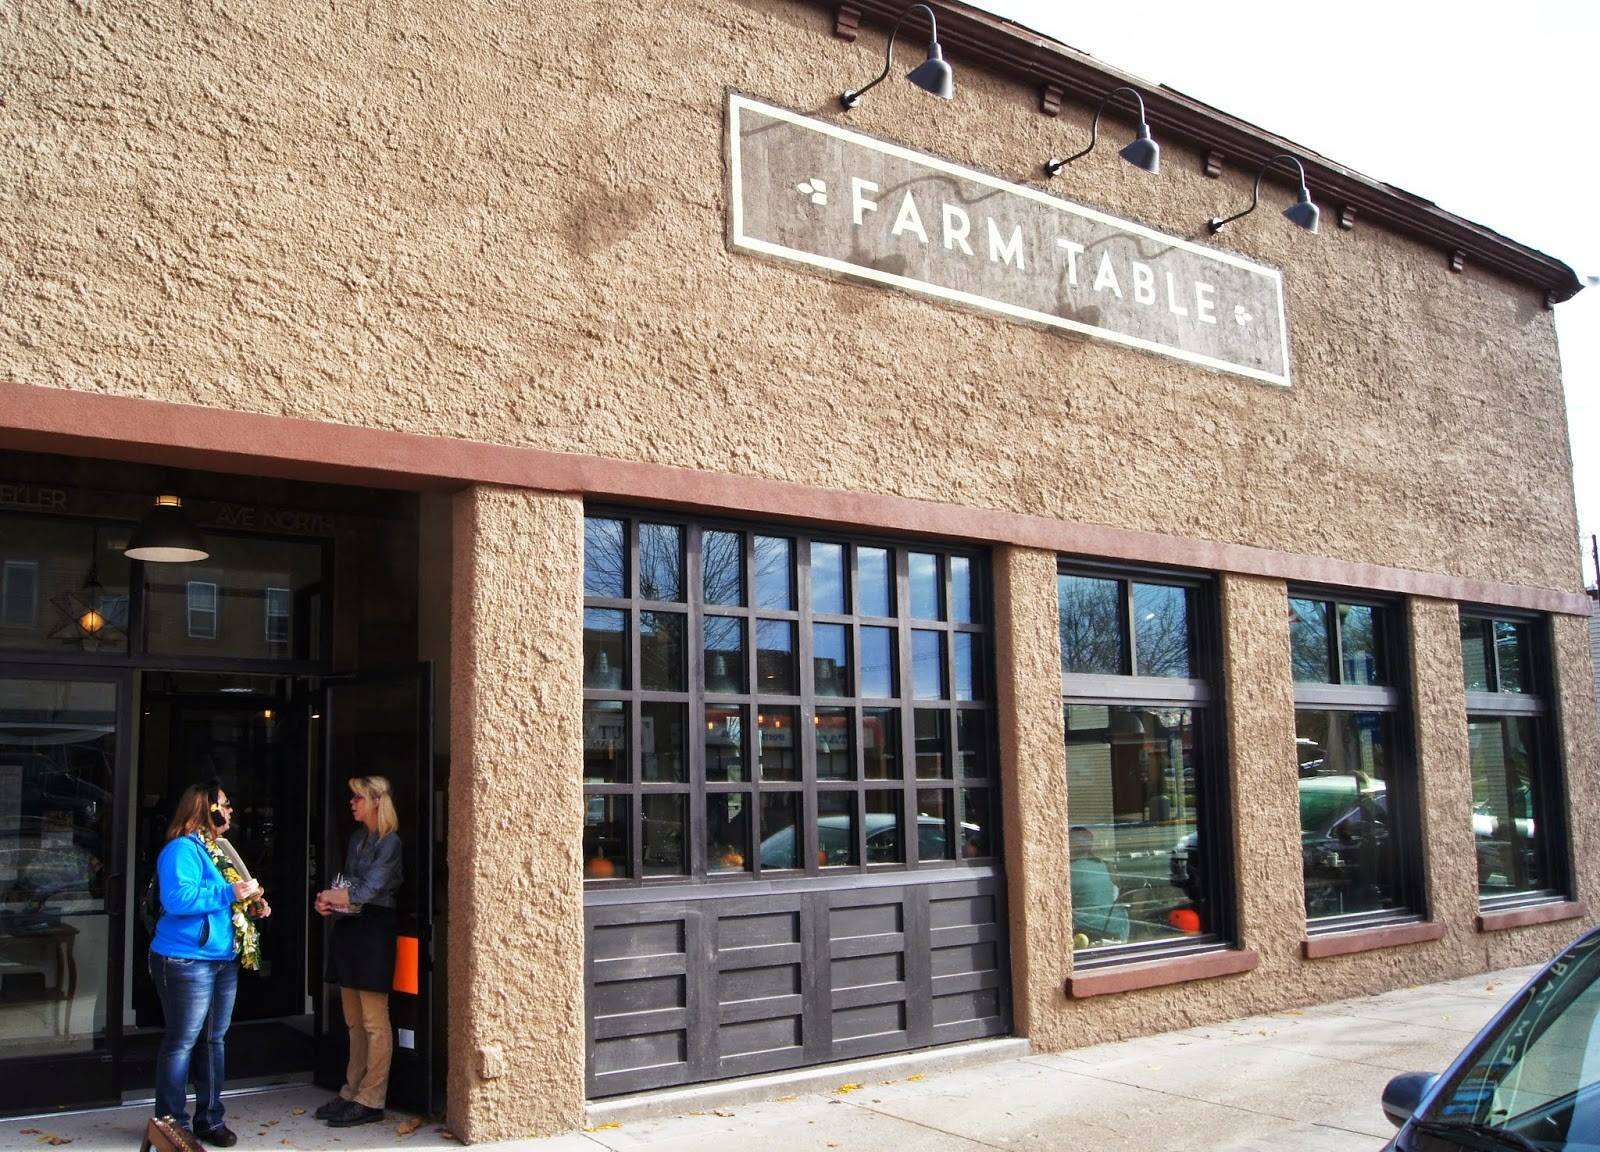 Farm Table Restaurant In Rural Amery Is Wisconsins Best Hidden Gem - Farm table amery wi